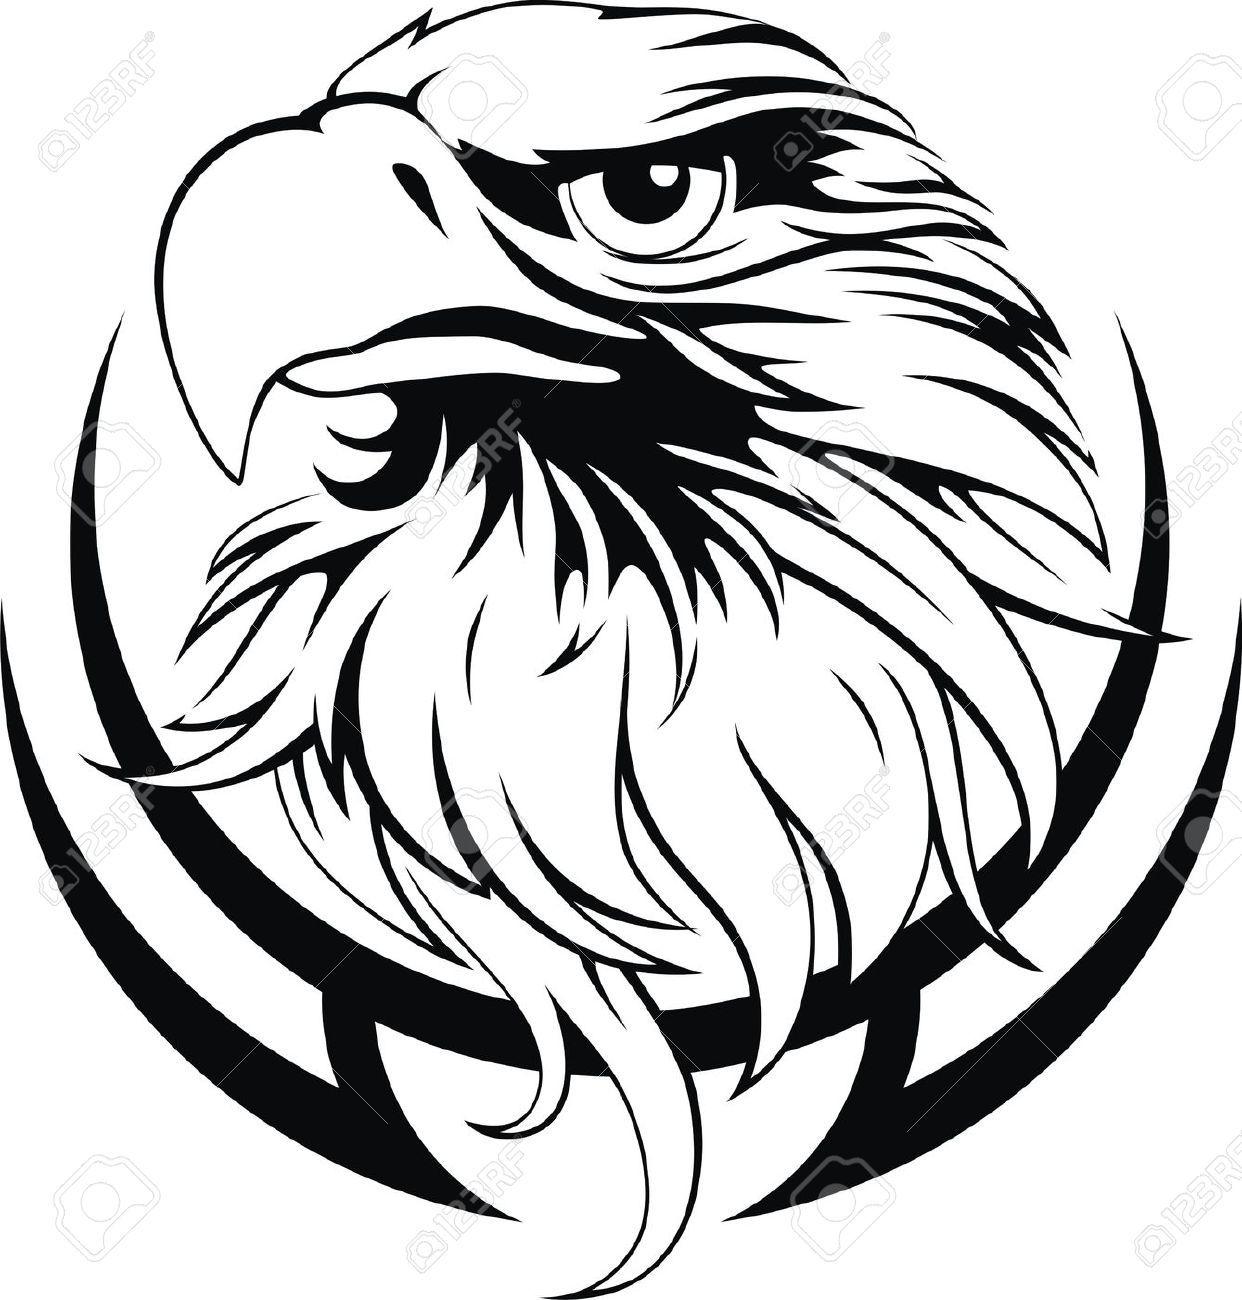 Black Hawk Cliparts, Stock Vector And Royalty Free Black Hawk.